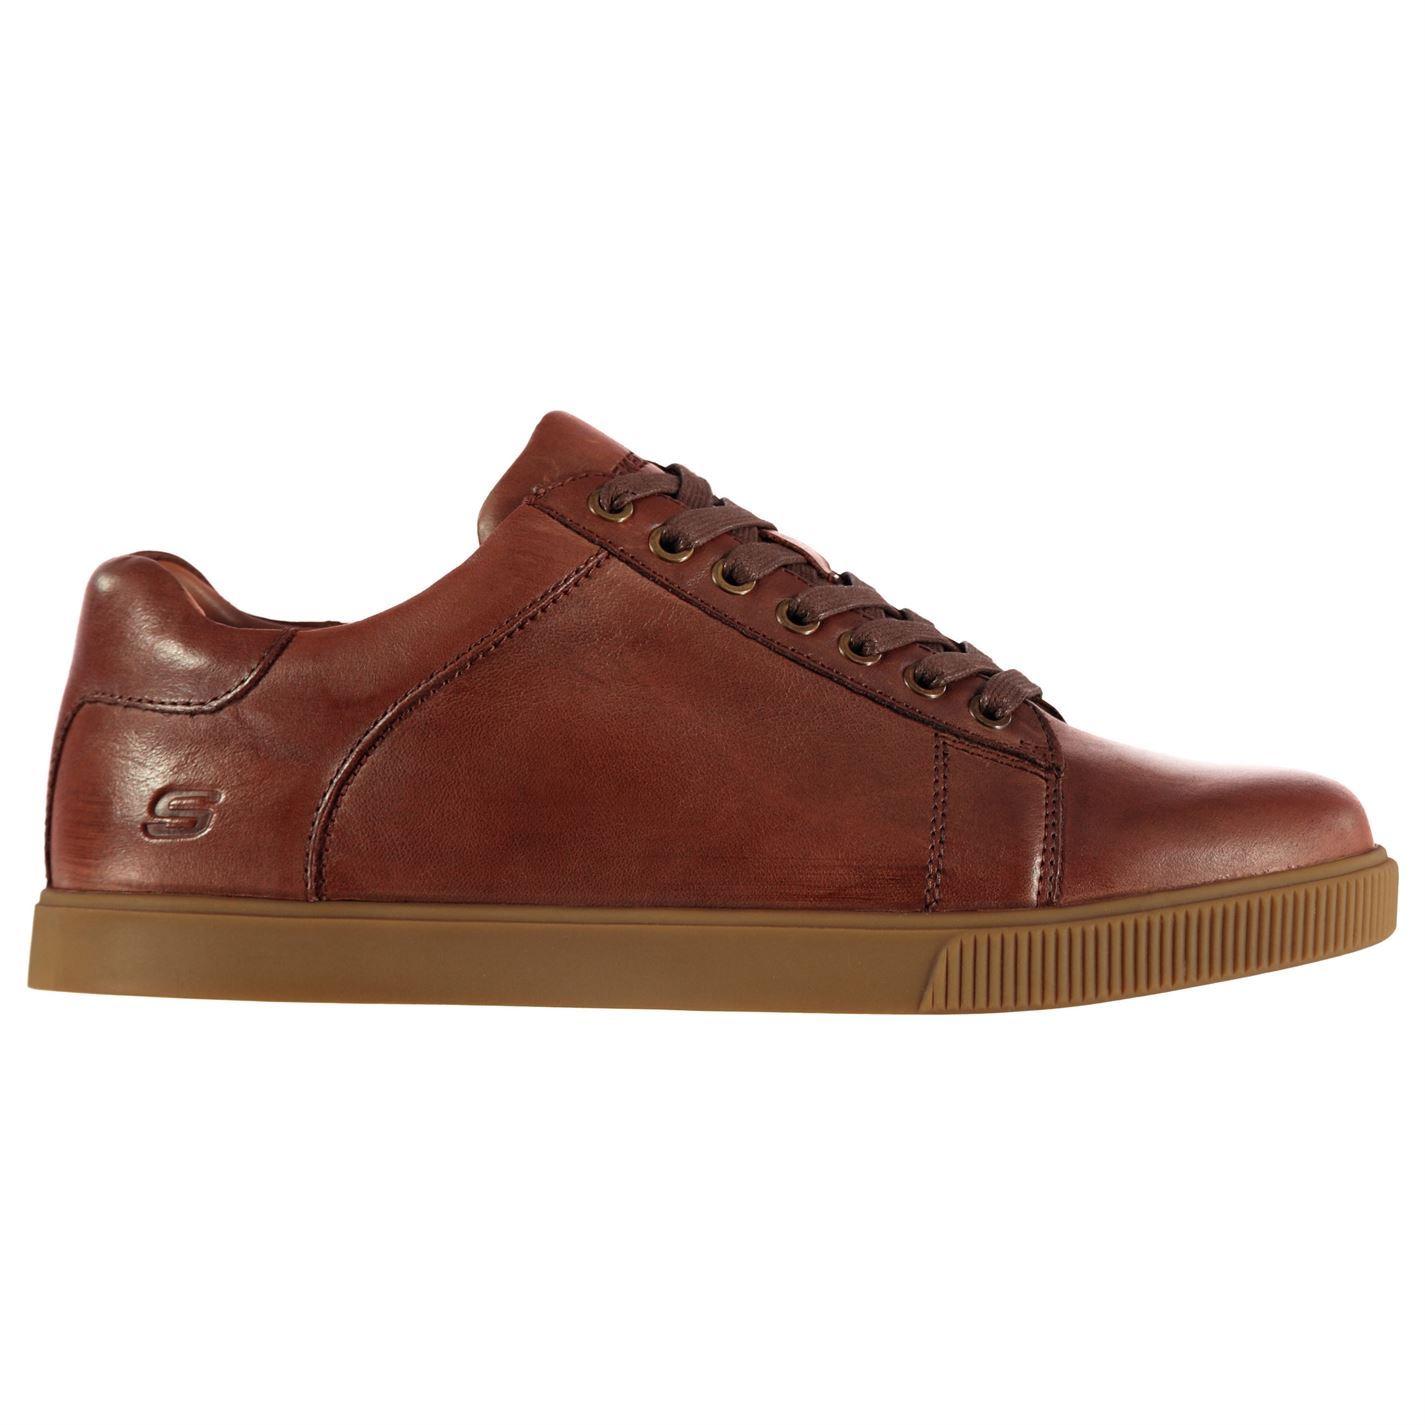 Skechers-Vol-Fandom-Homme-Chaussures-Baskets-decontractees-chaussures-baskets miniature 12